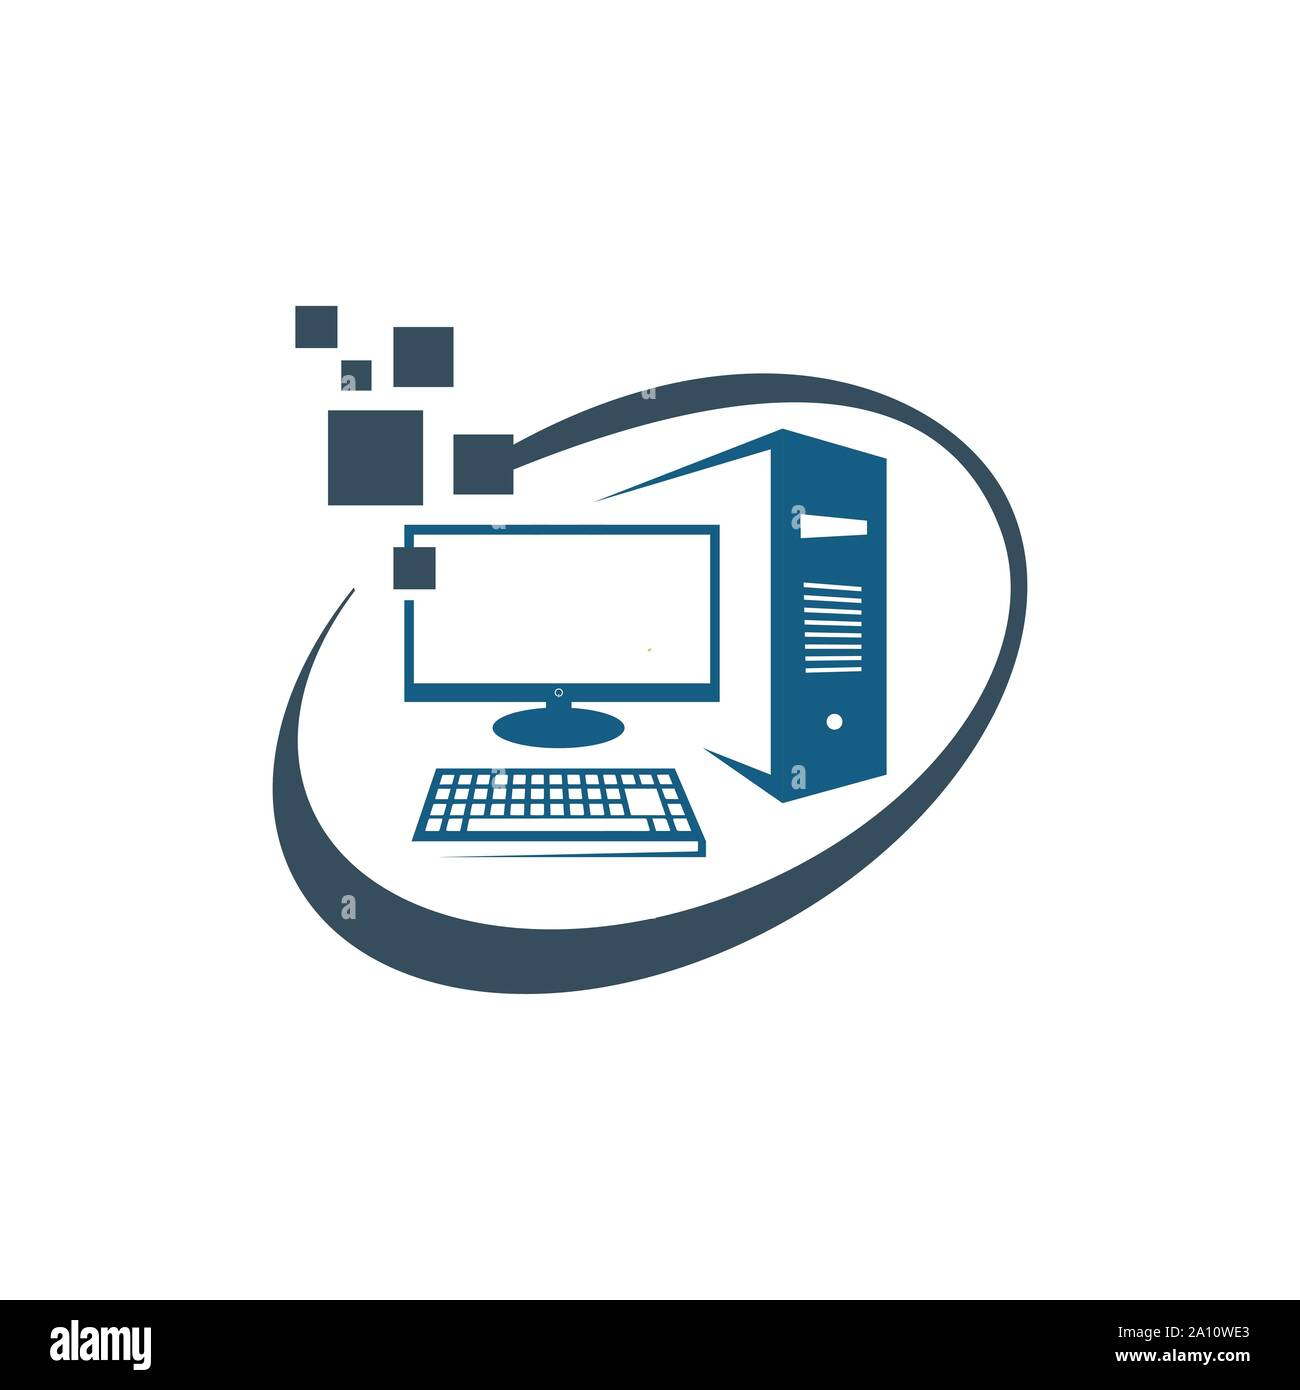 computer desktop PC logo design vector icon illustrations Stock Vector  Image & Art - Alamy